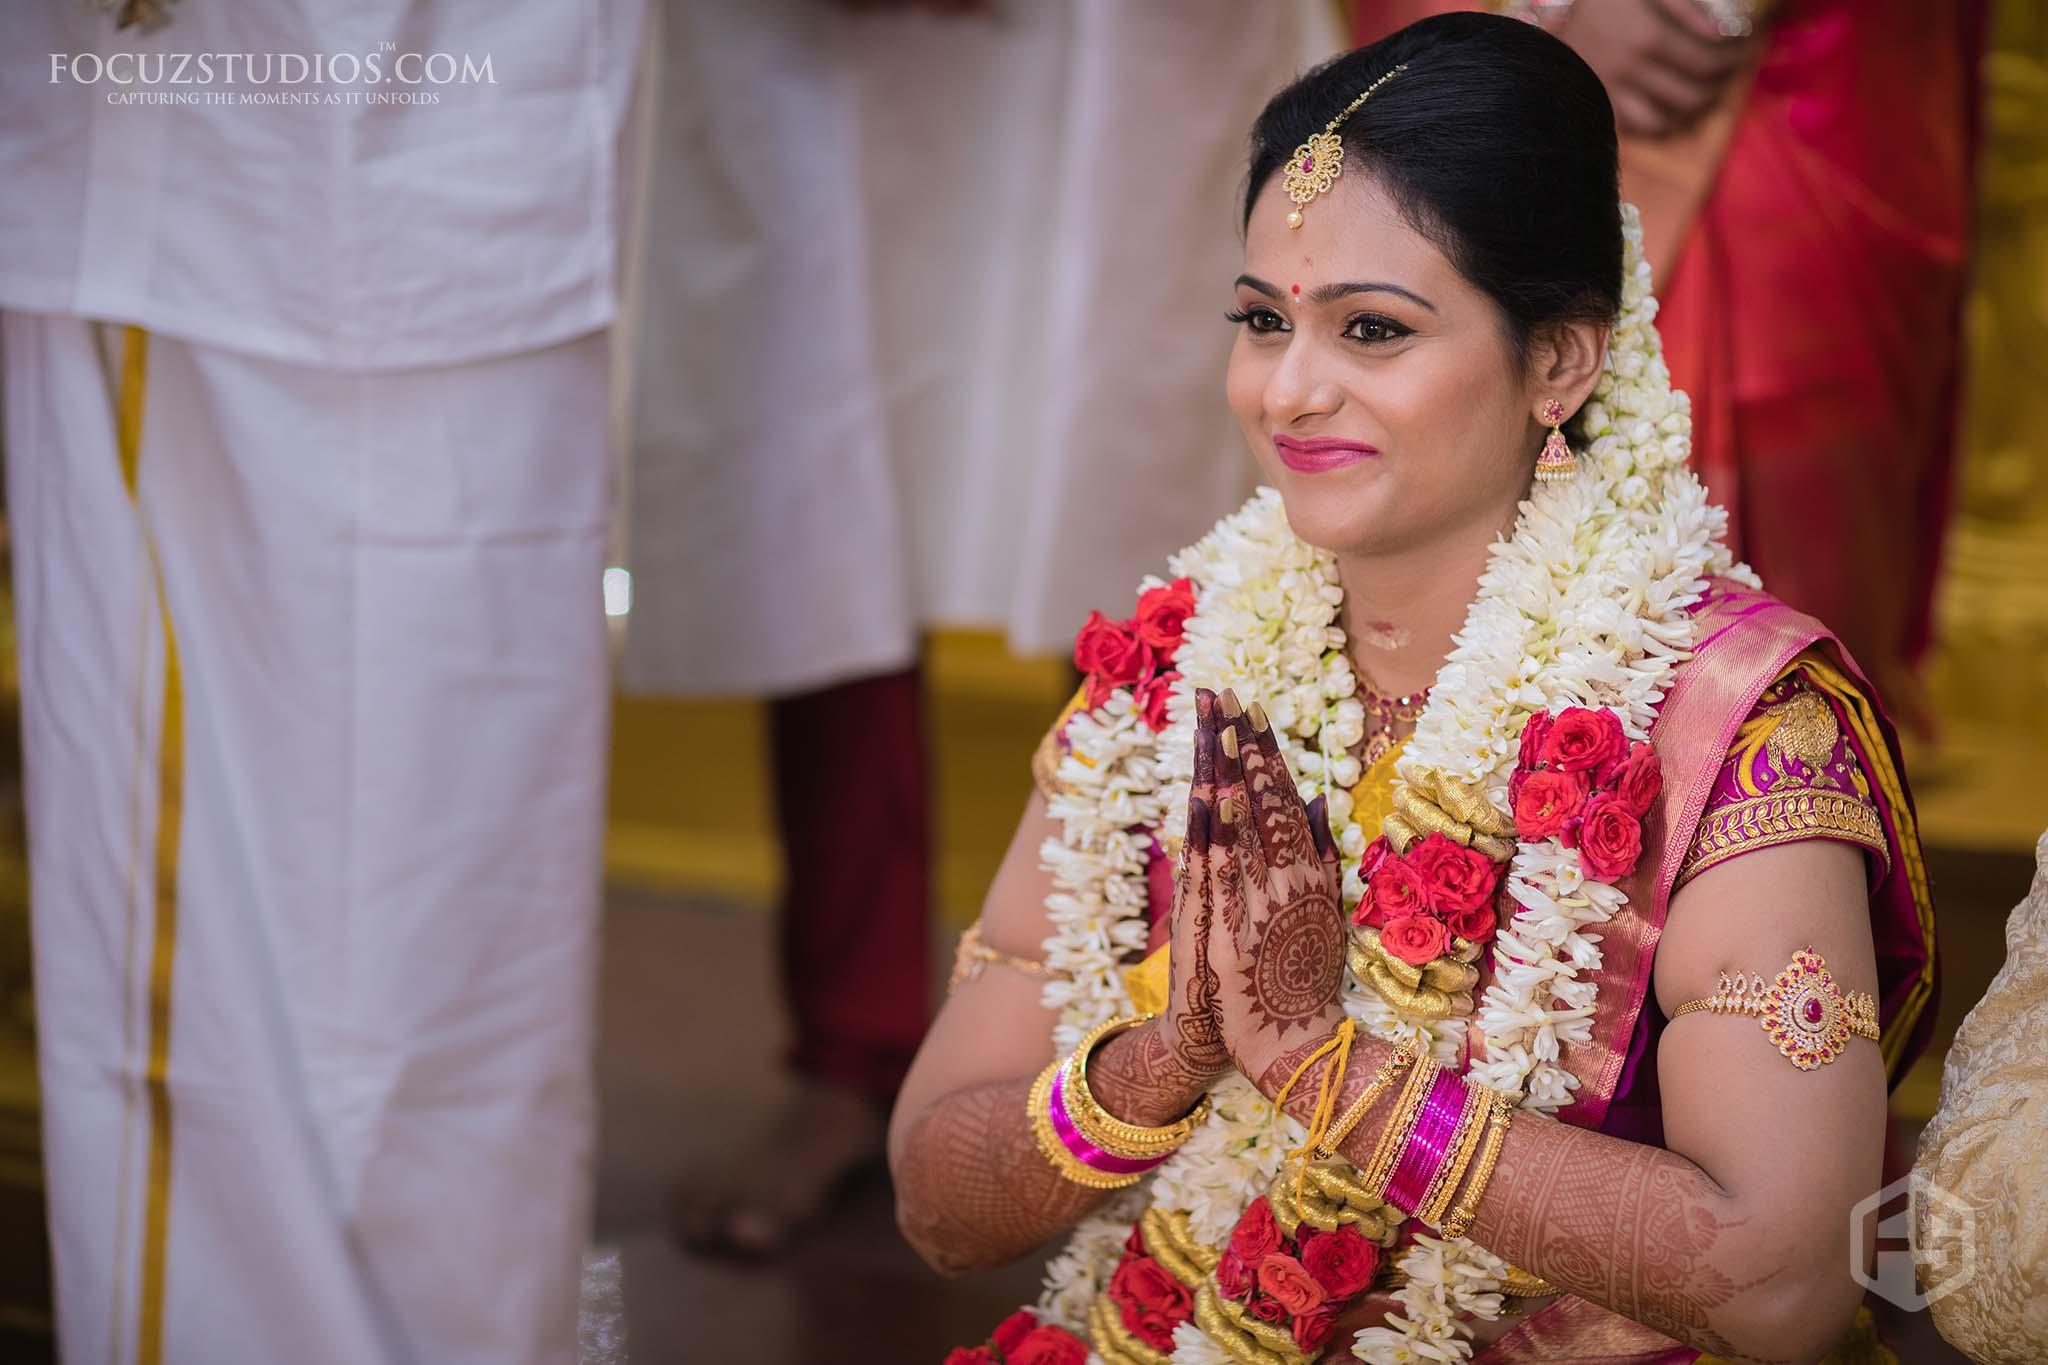 avm-rajeswari-kalyana-mandapam-wedding-photographers-photos-15